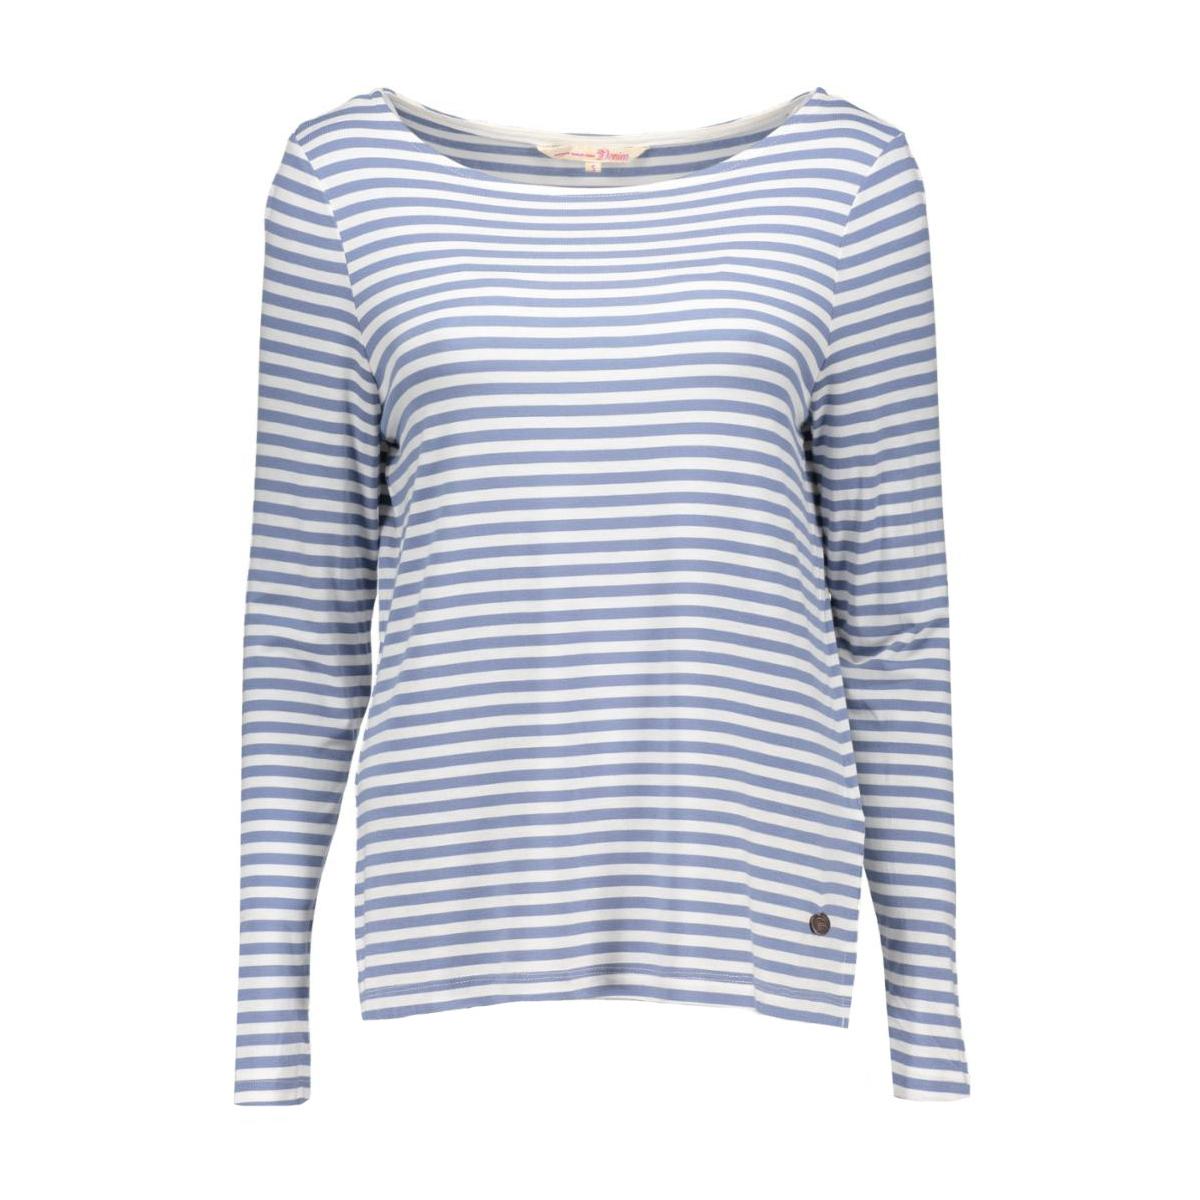 1033486.09.71 tom tailor t-shirt 6731